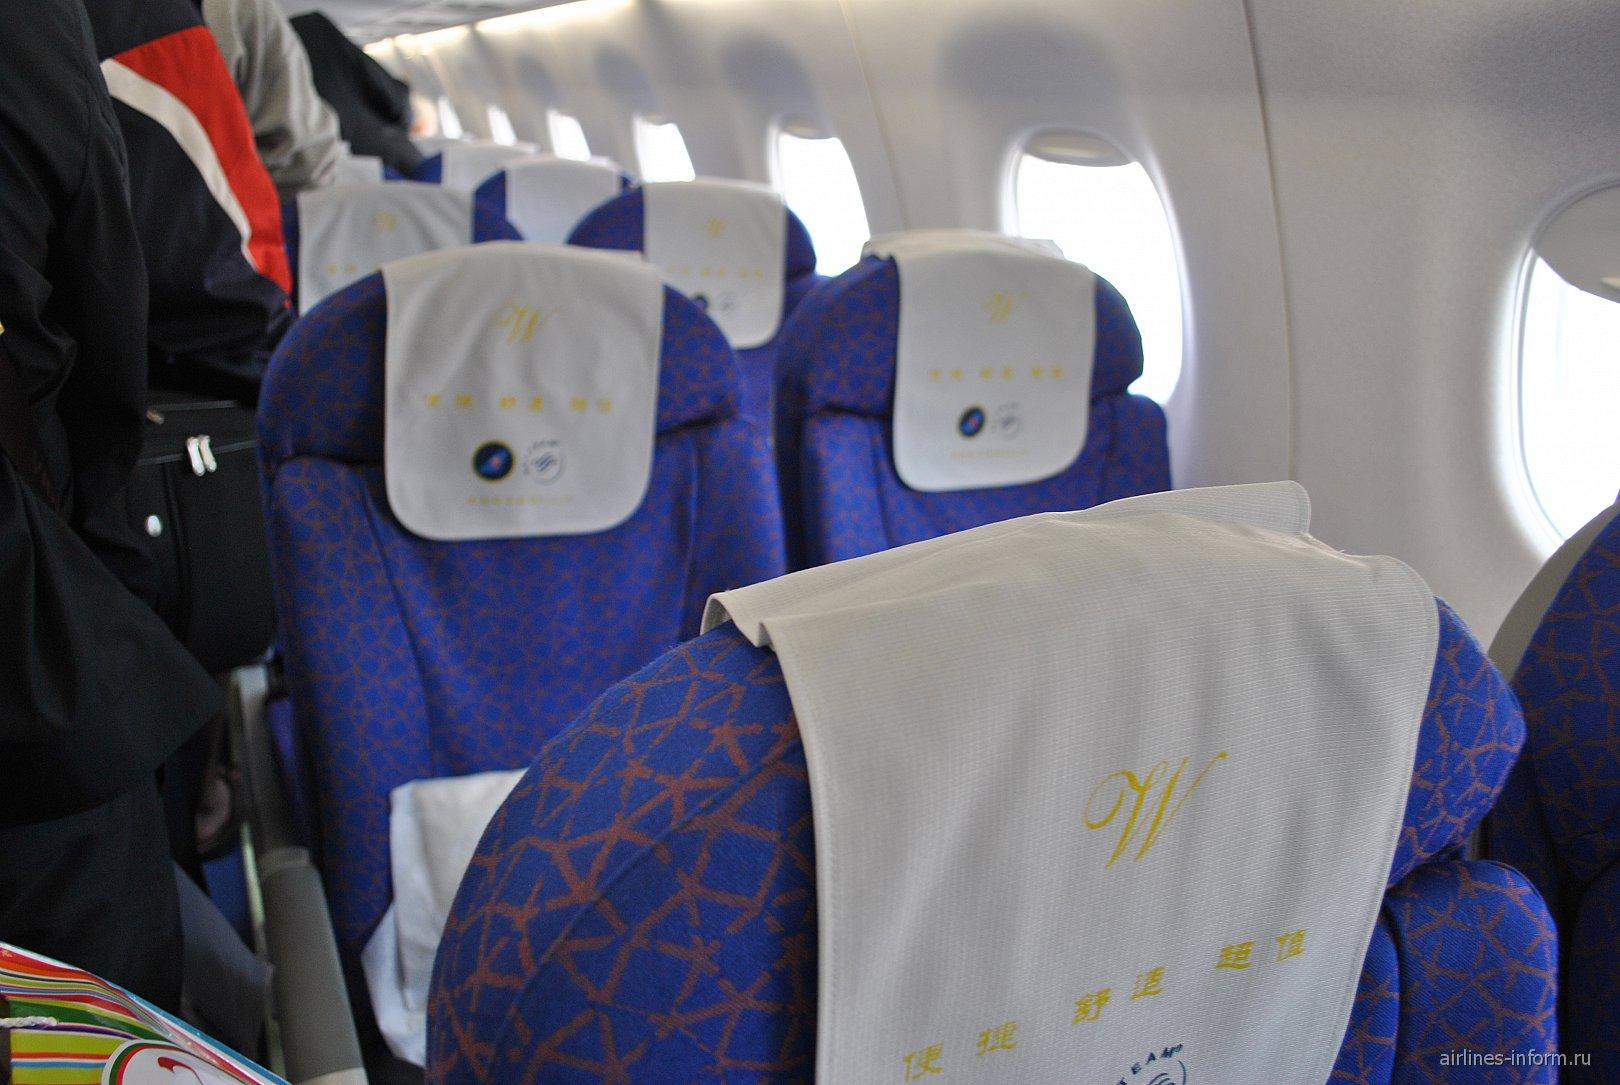 Самолет Embraer 190 авиакомпании China Southern Airlines